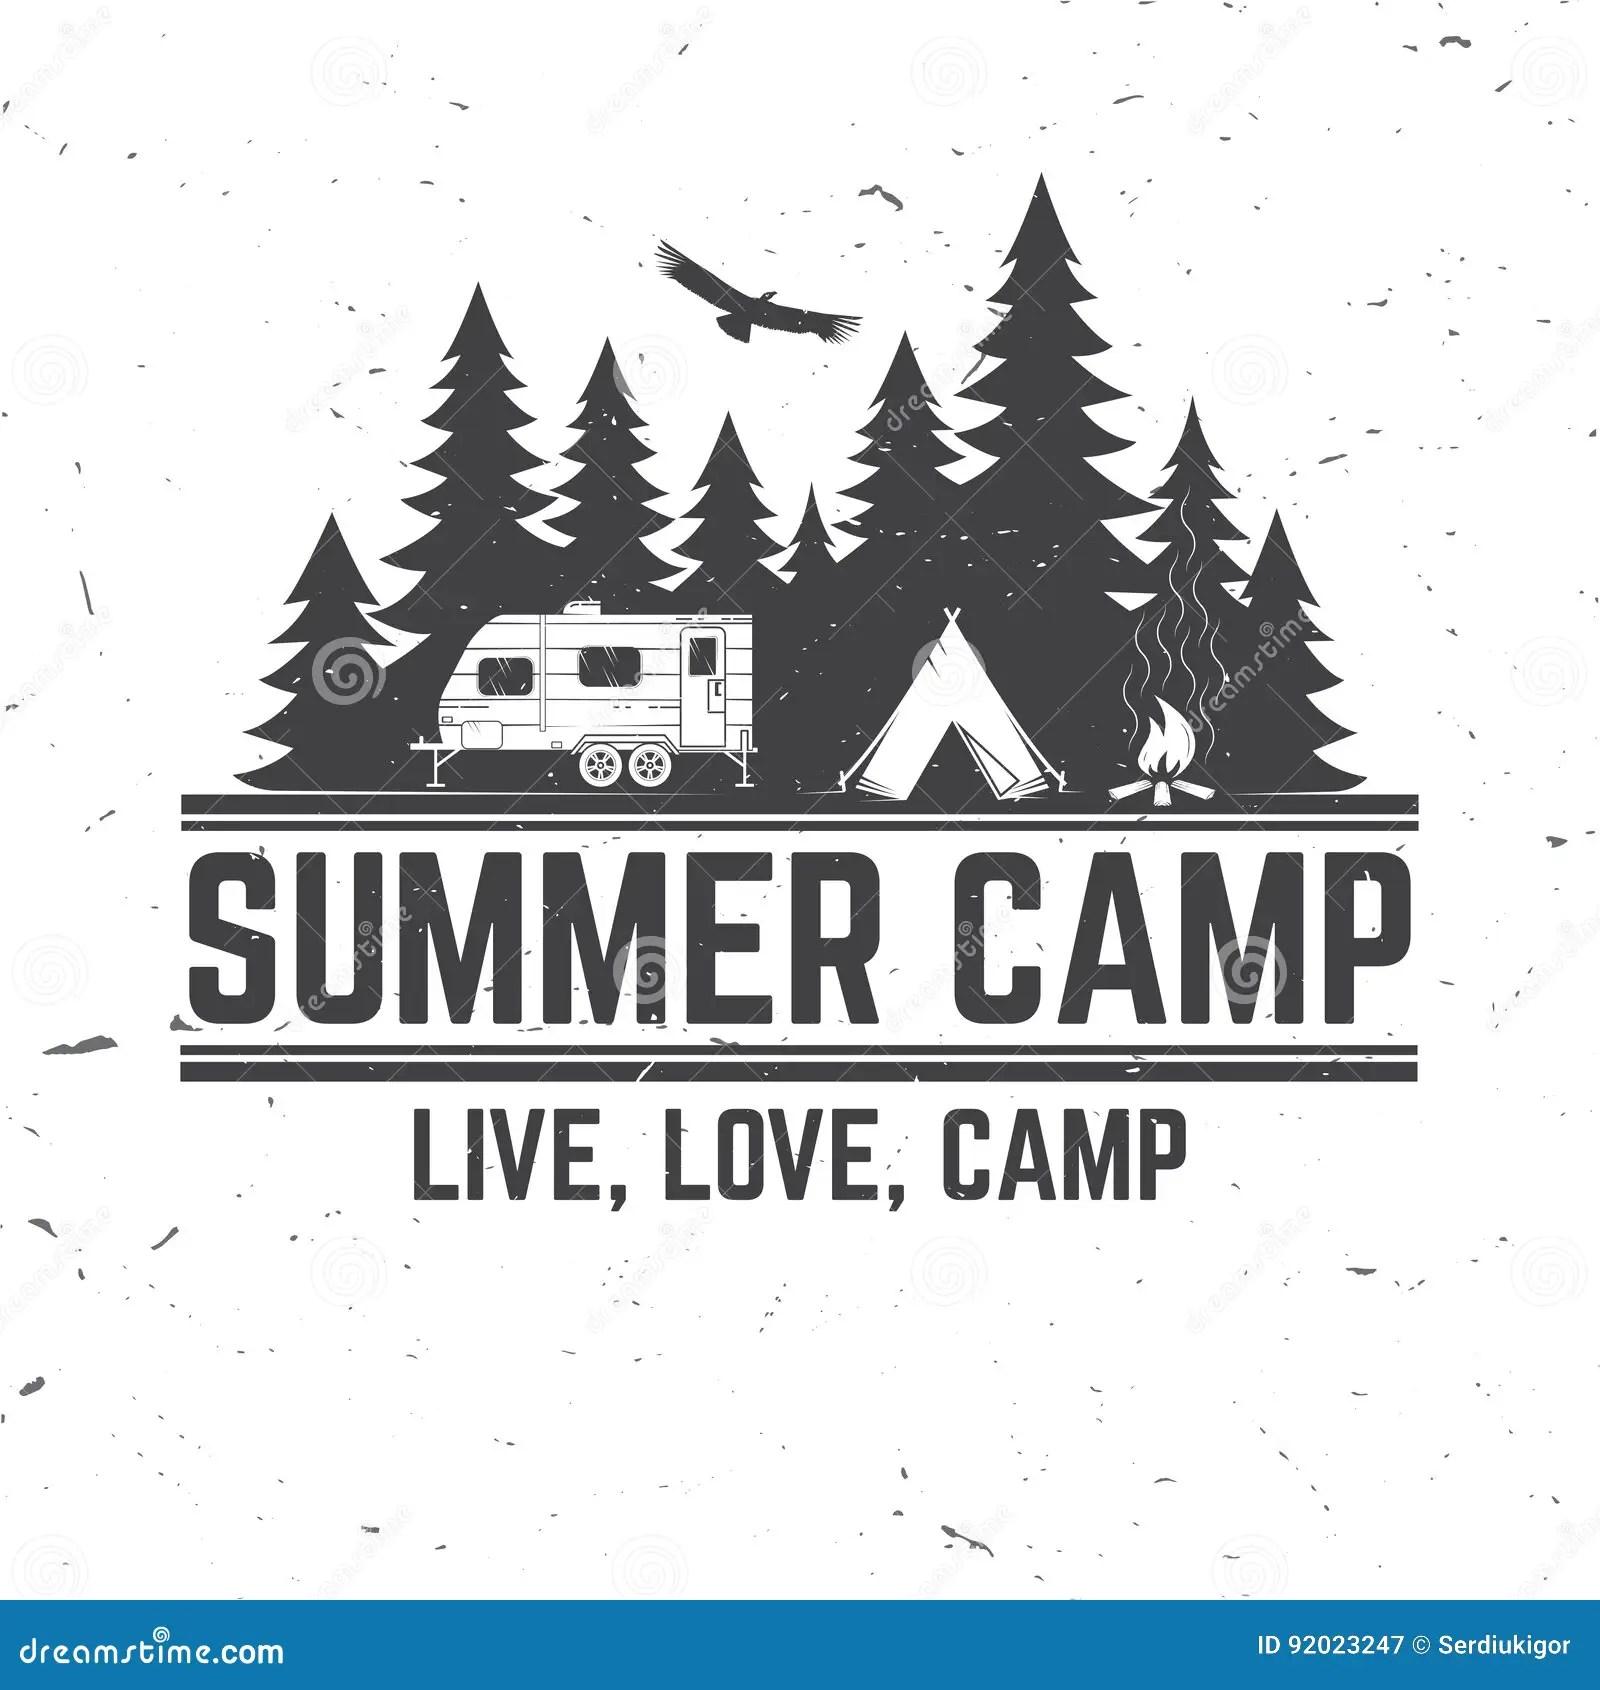 Summer Camp Vector Illustration Concept For Shirt Or